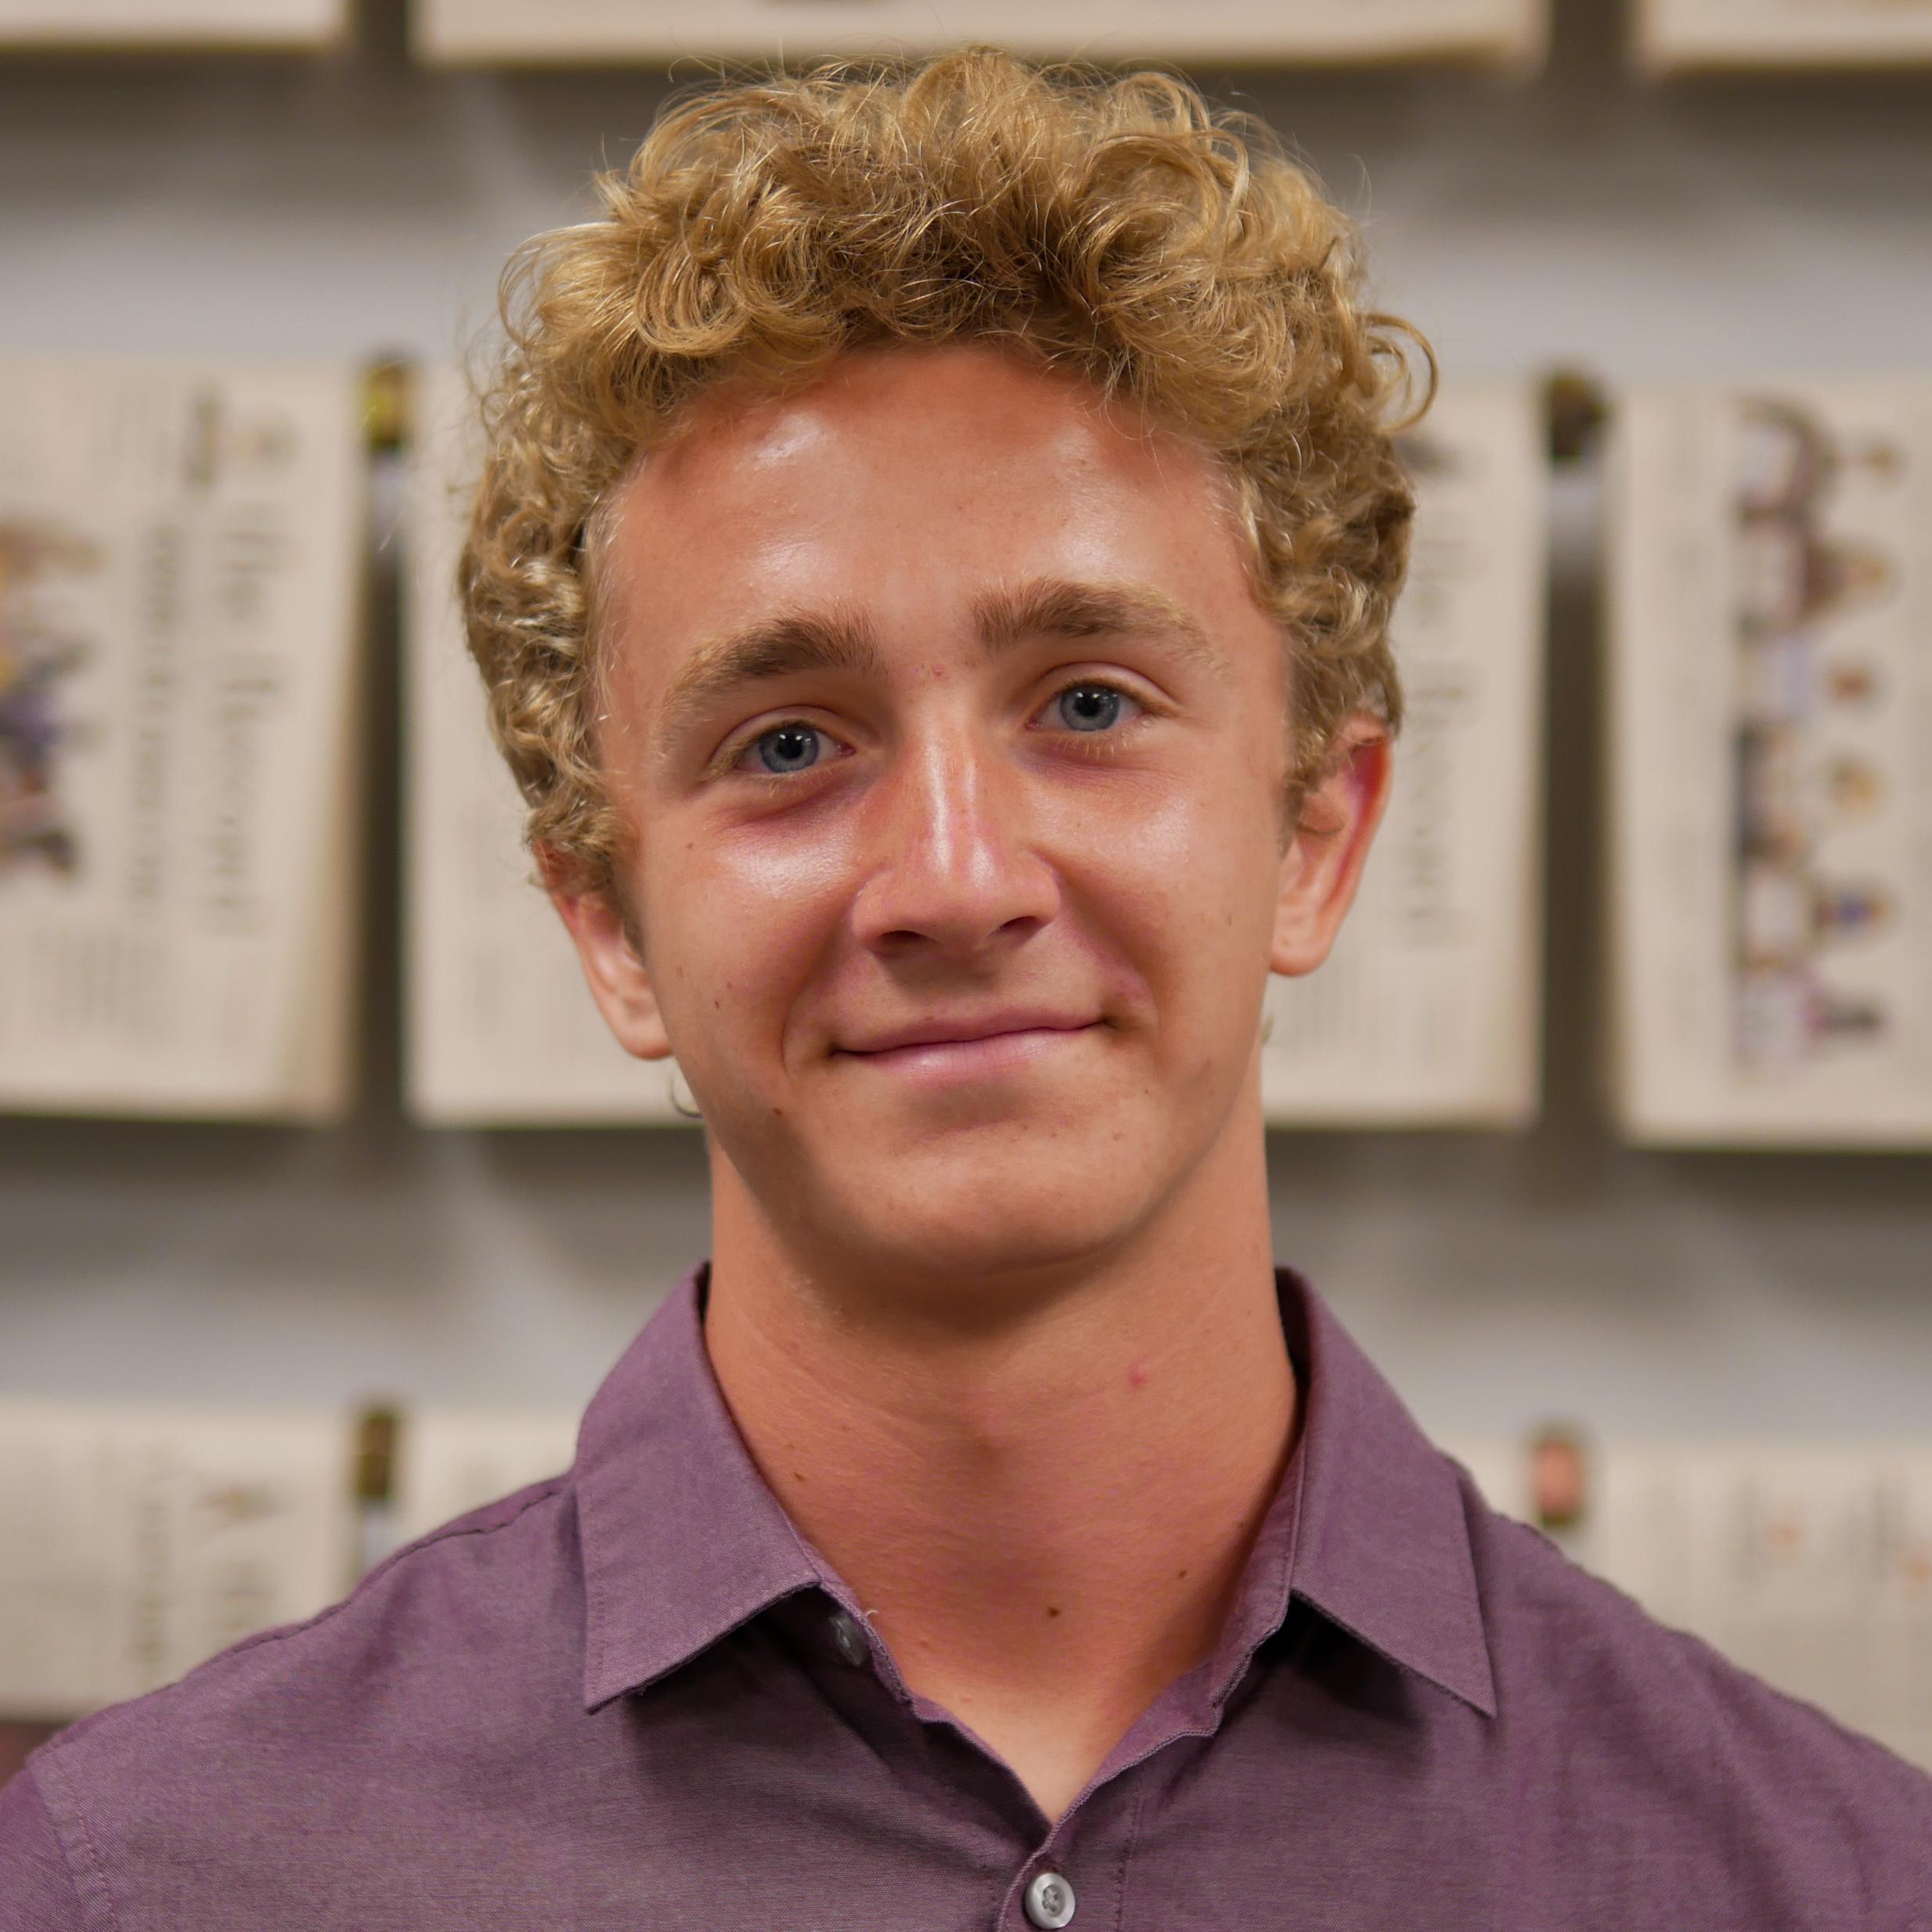 Portrait of Caleb Shenk